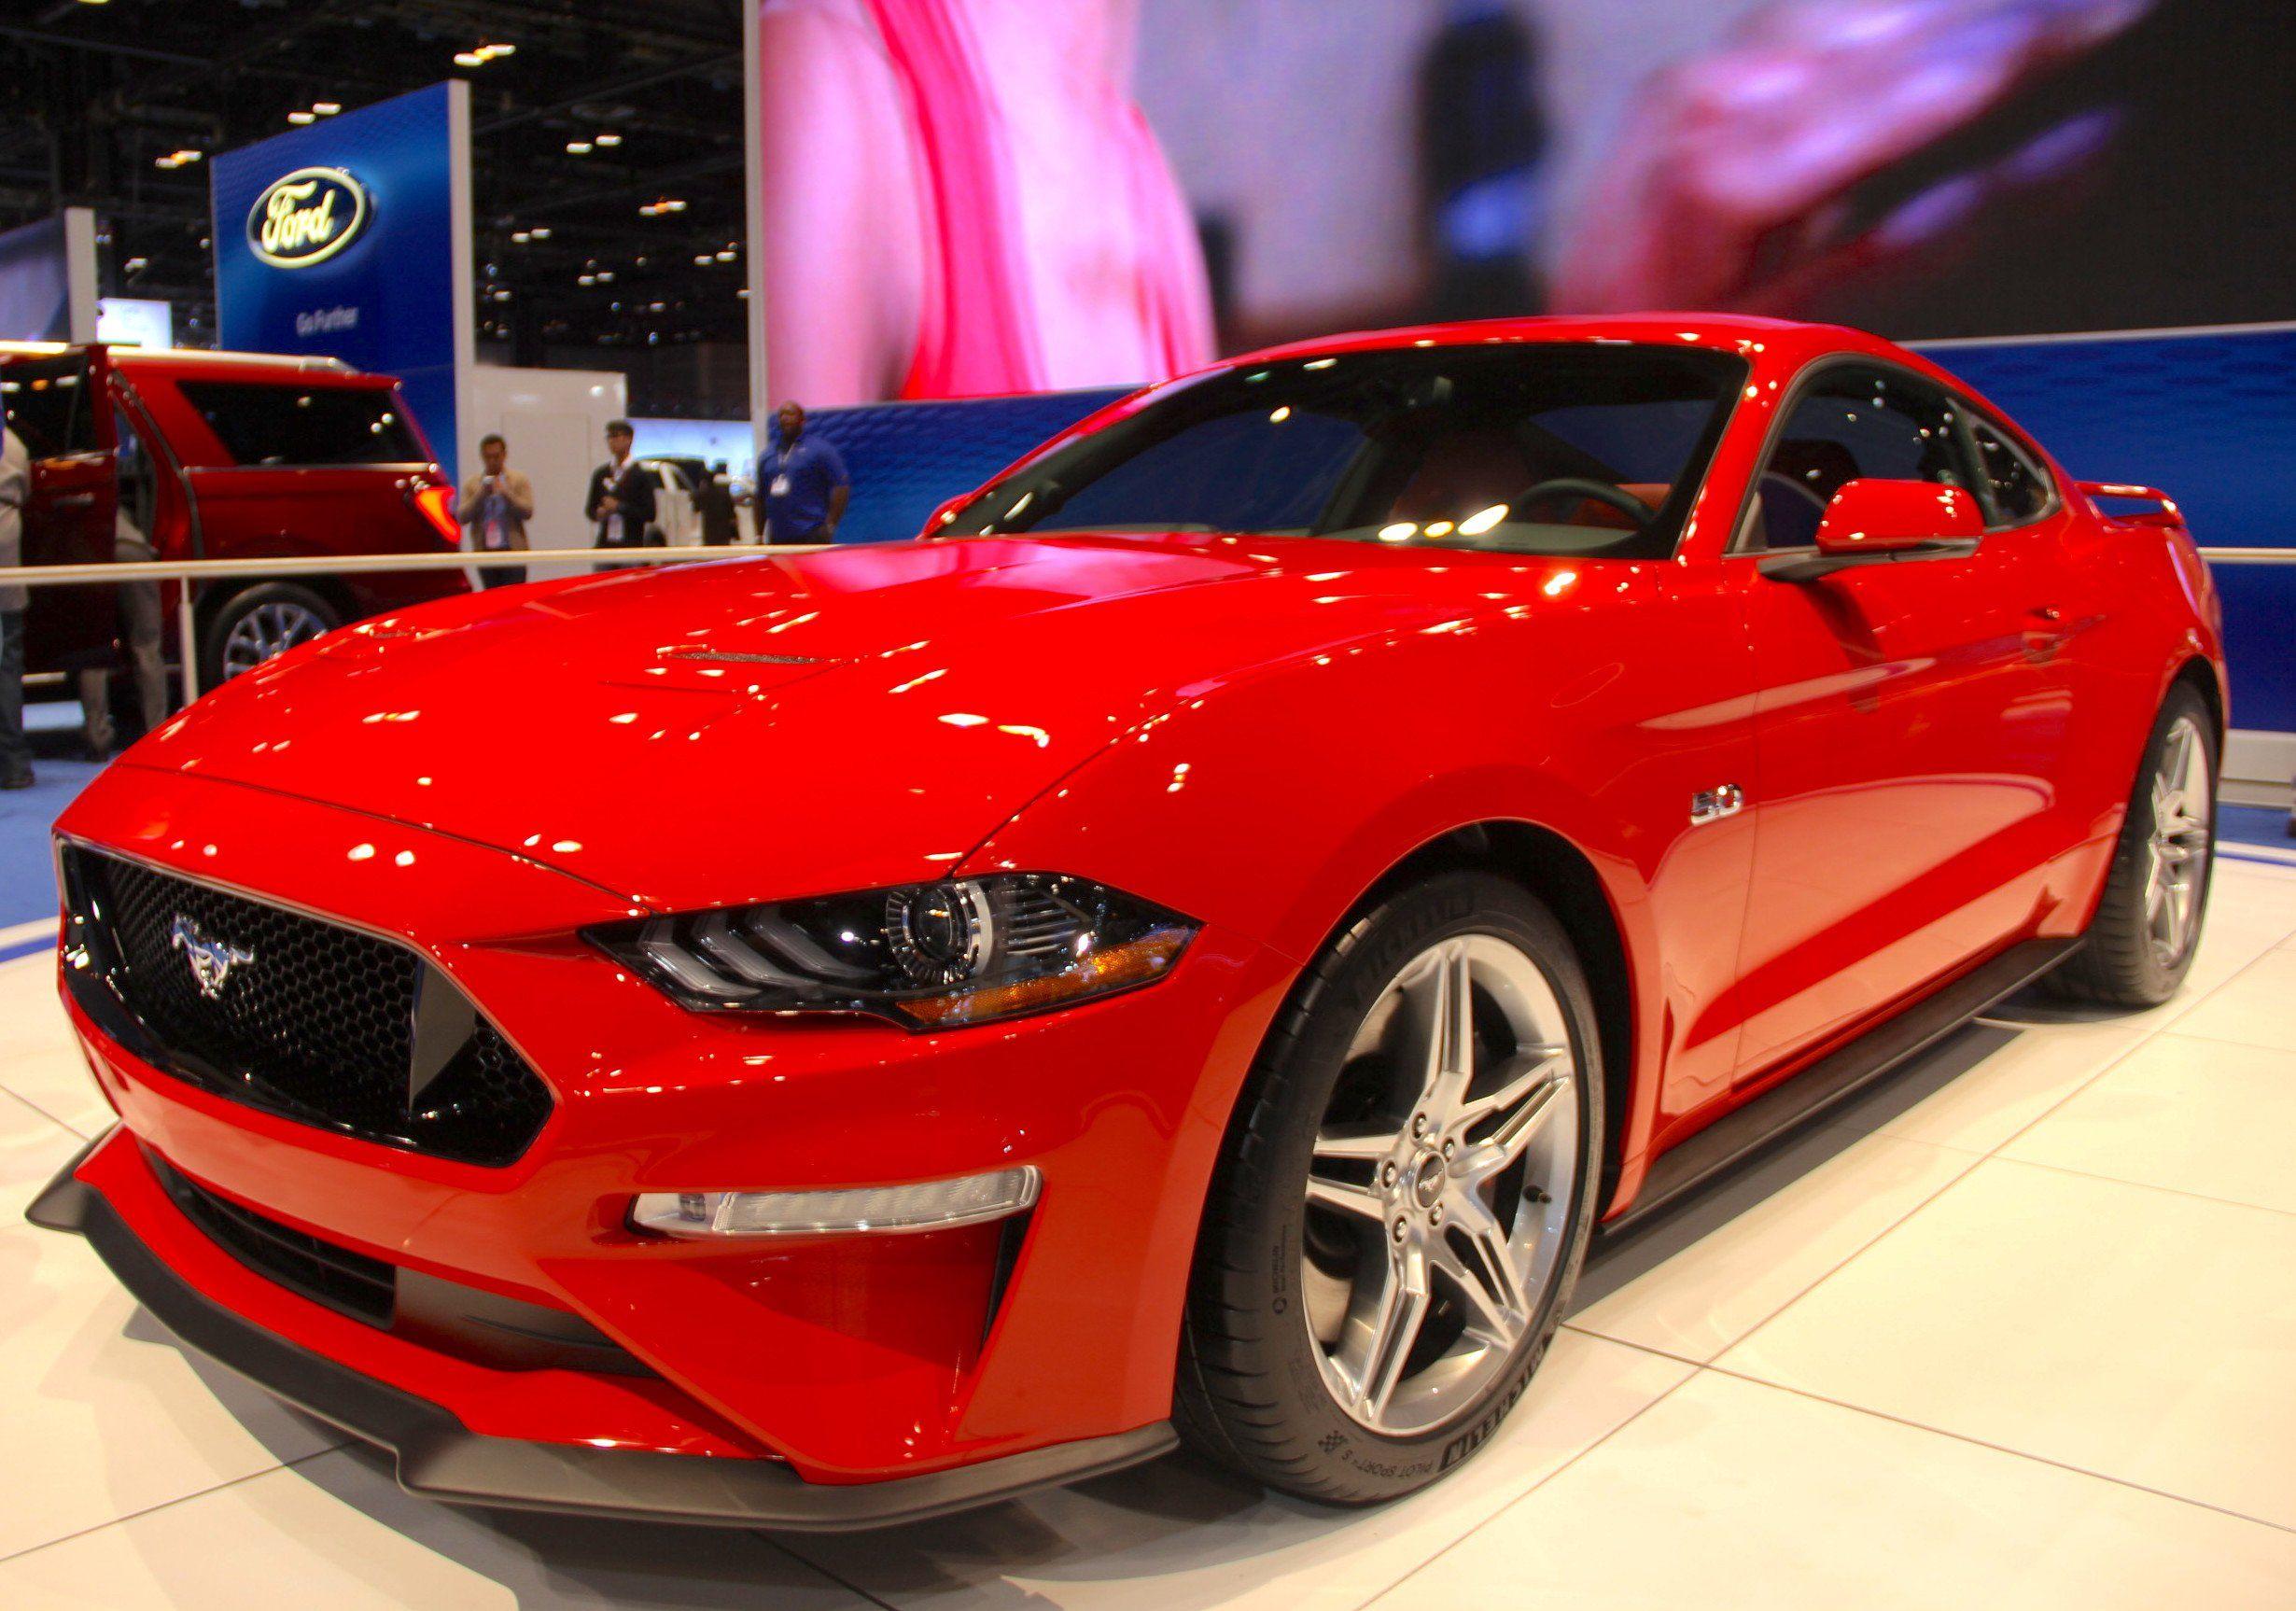 What 2018 Ford Mustang Looks Like - https://musclecarheaven.net/2018 ...